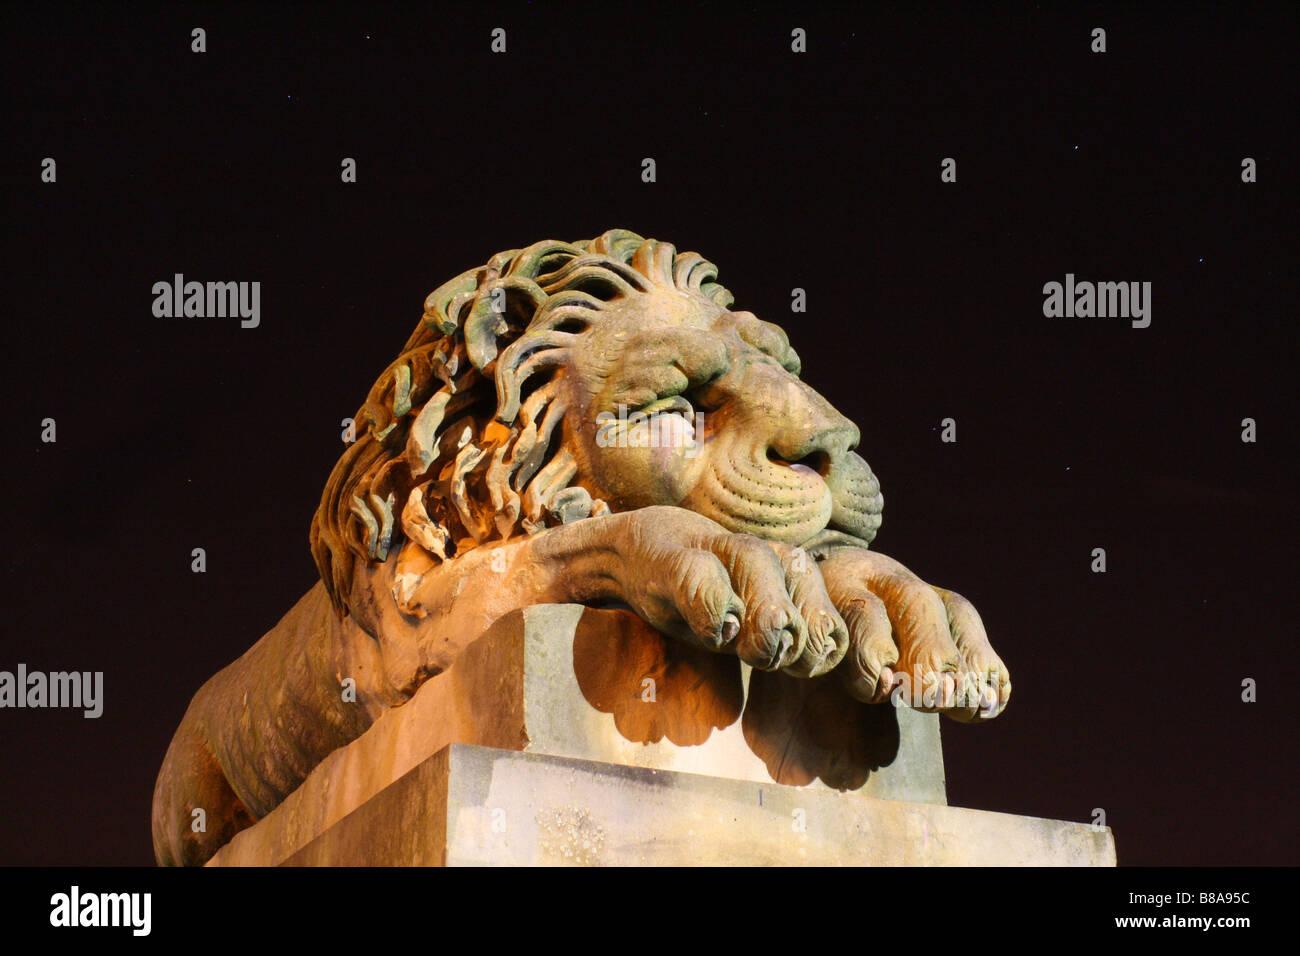 Sleeping Lion statue - Stock Image